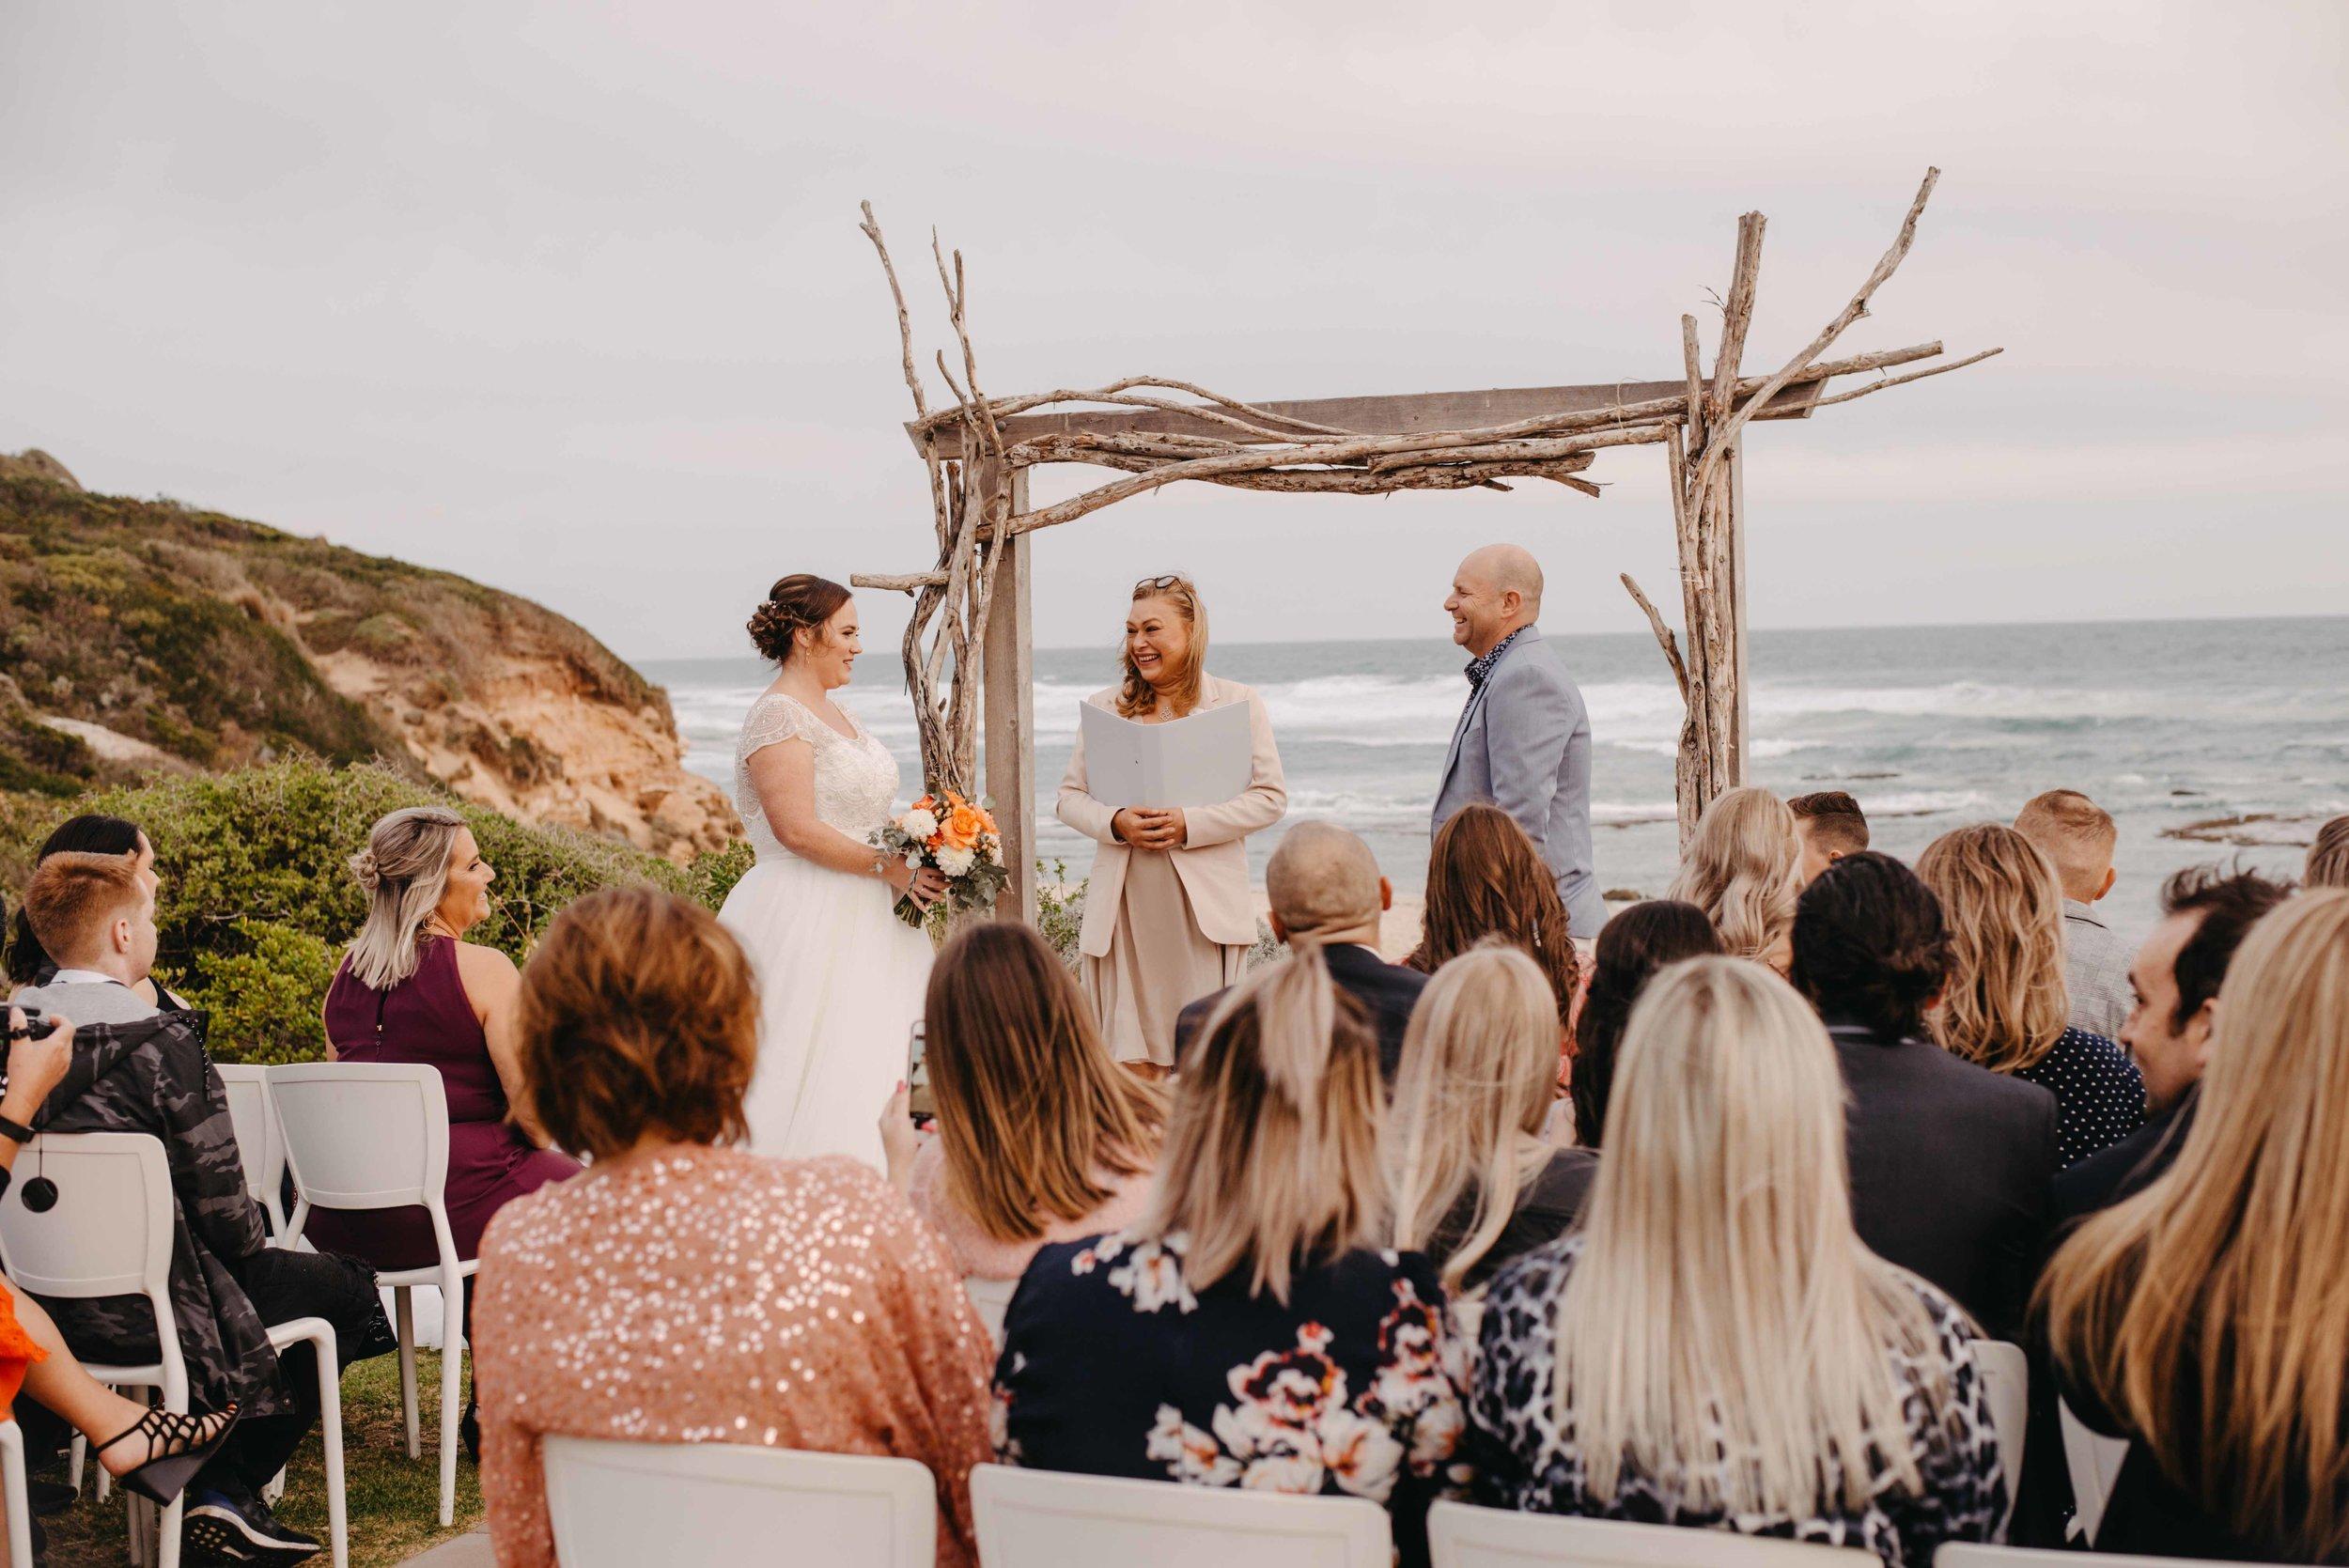 All-Smiles-Sorrento-Wedding-photography-sorrento-wedding-marissa-jade-photography-39.jpg